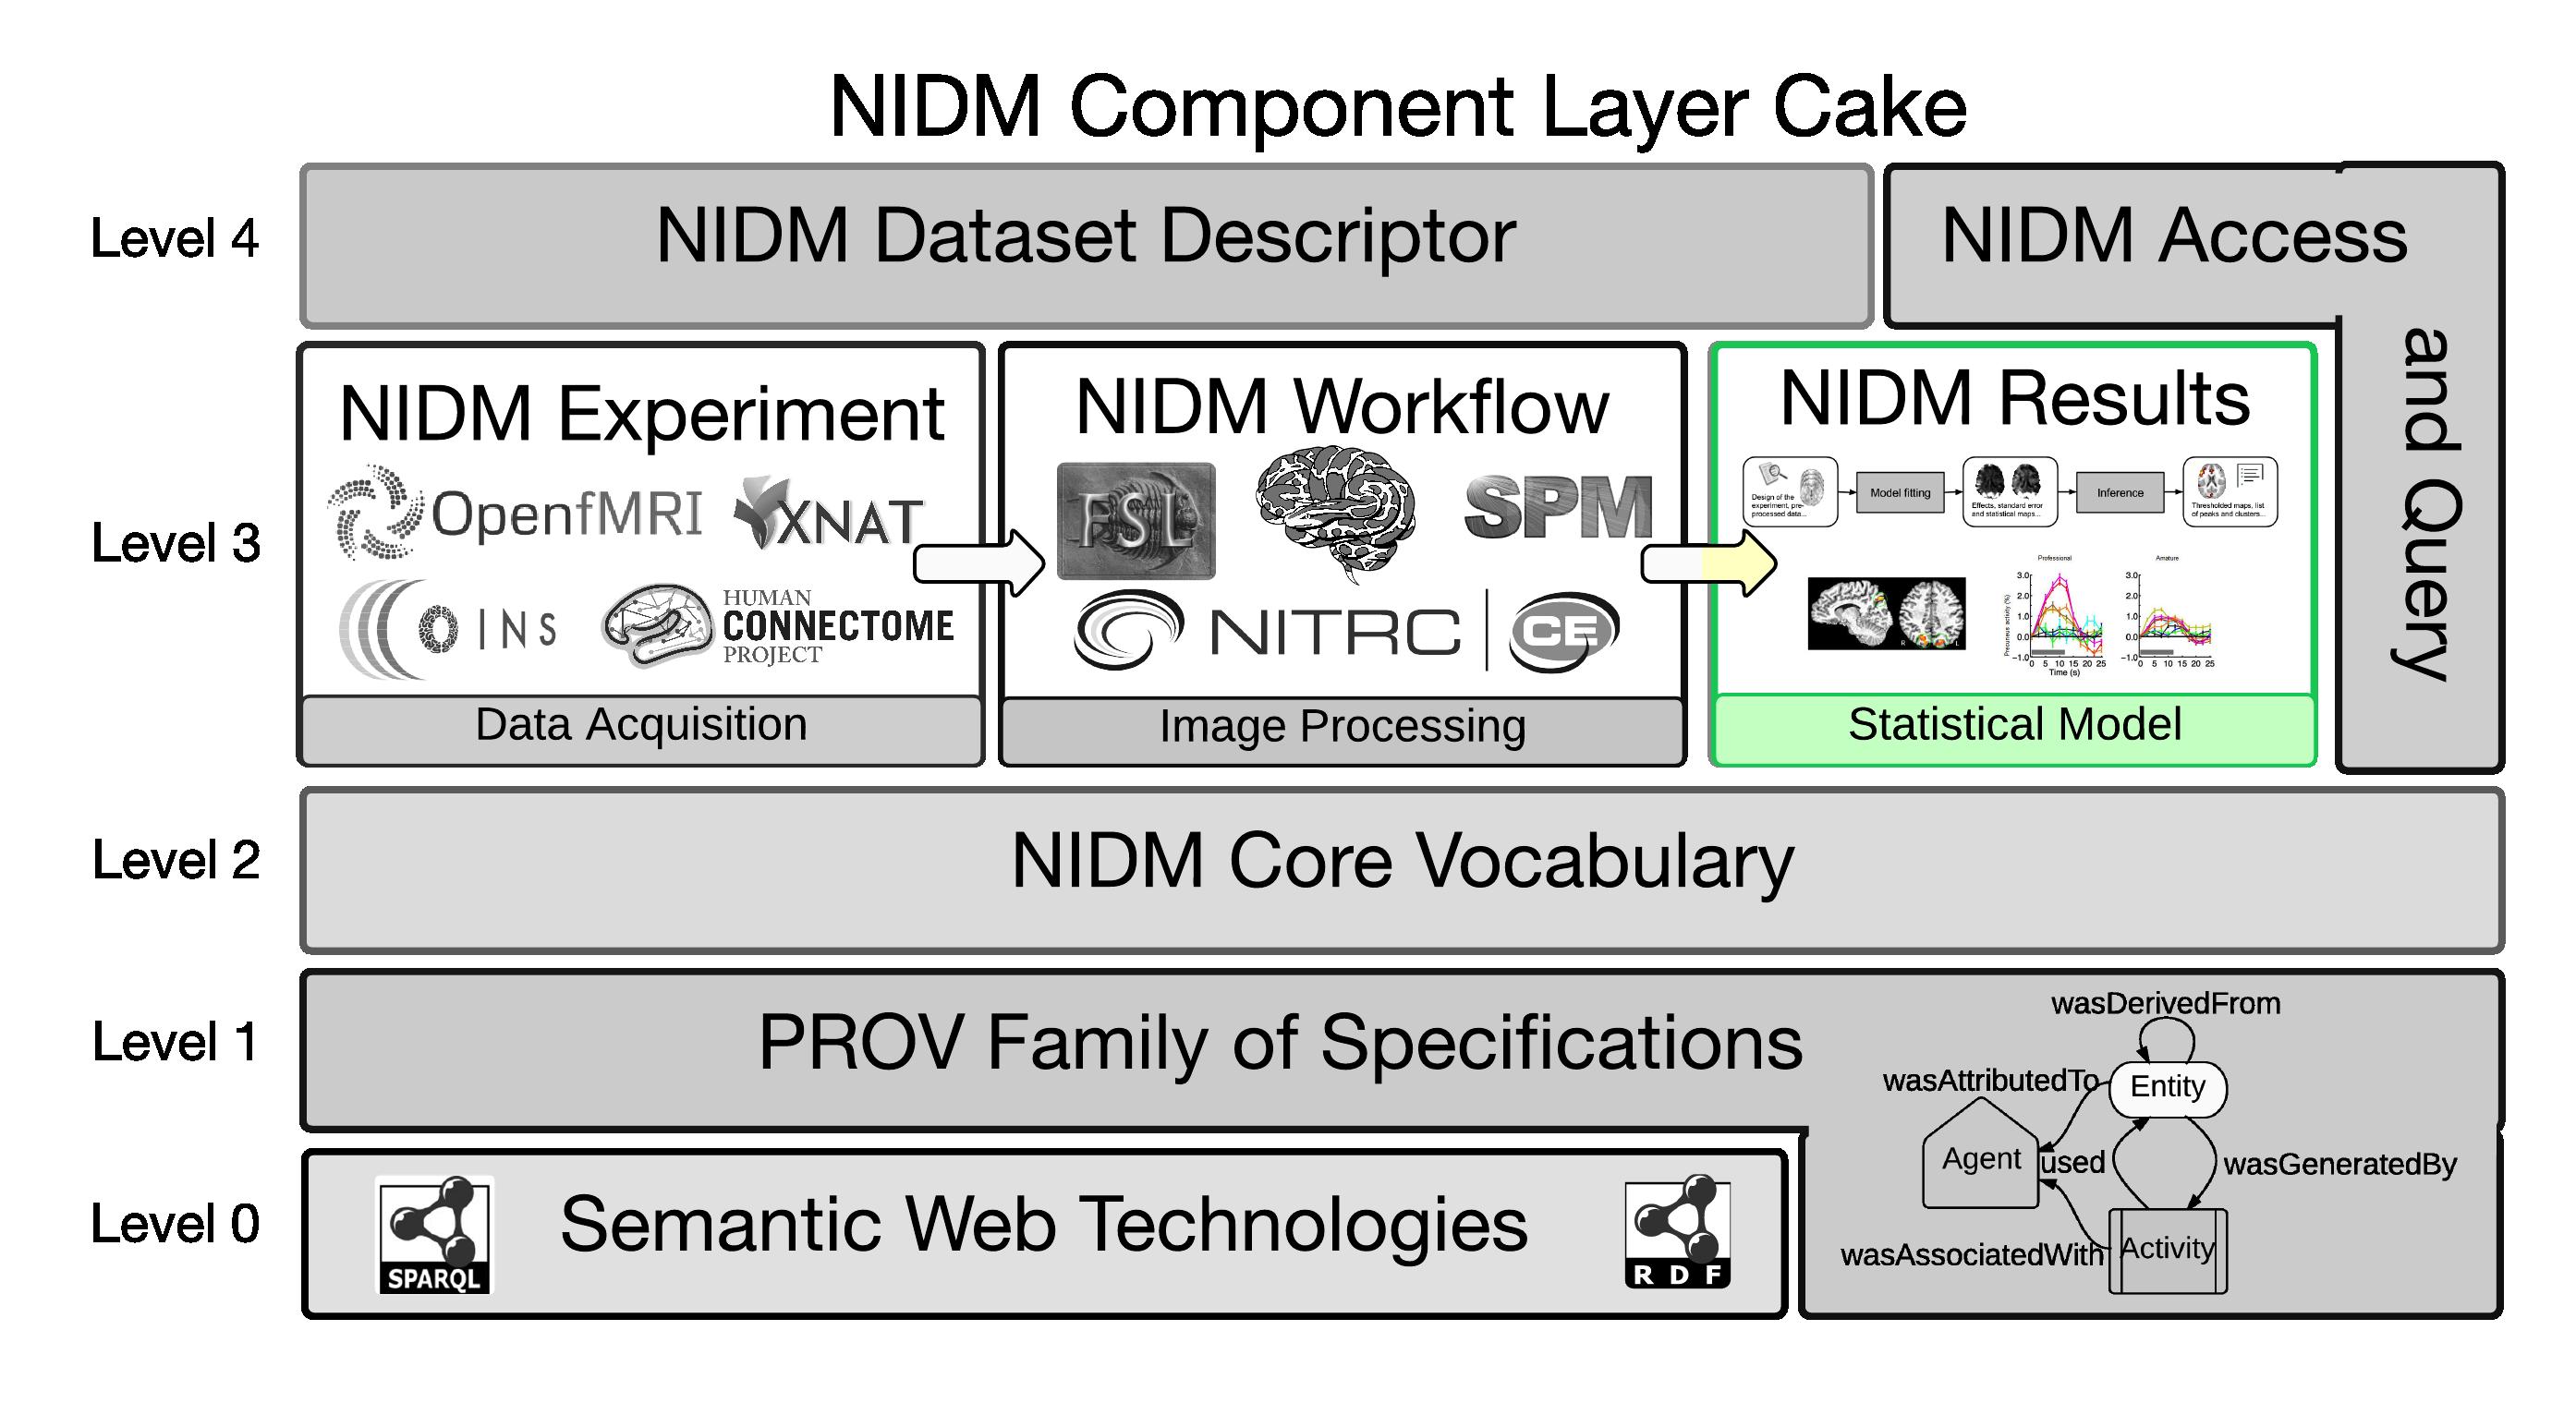 NIDM-Results (under development)